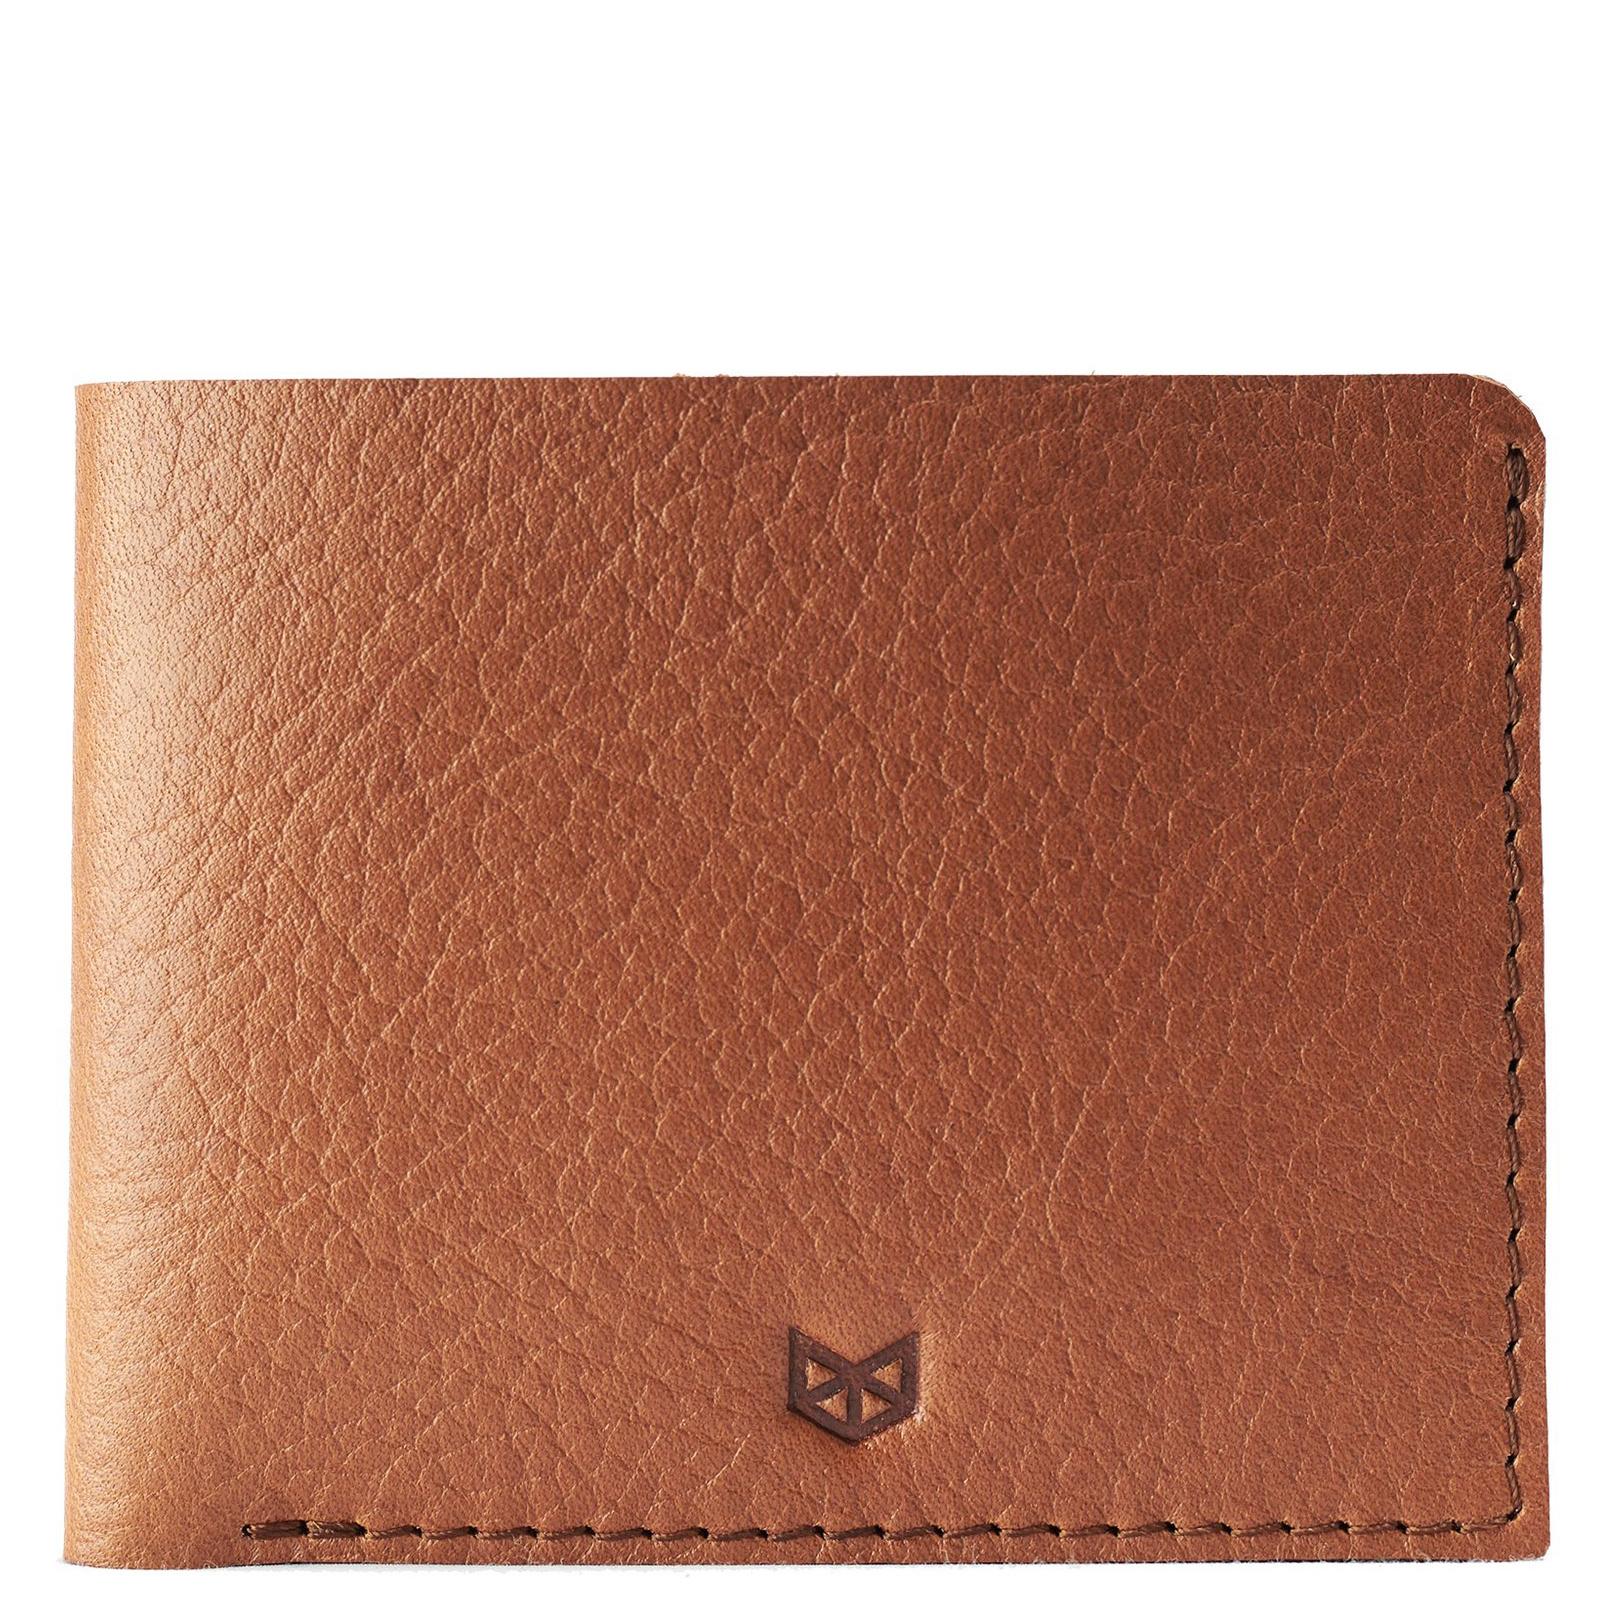 Slim Wallet Kit - Tan